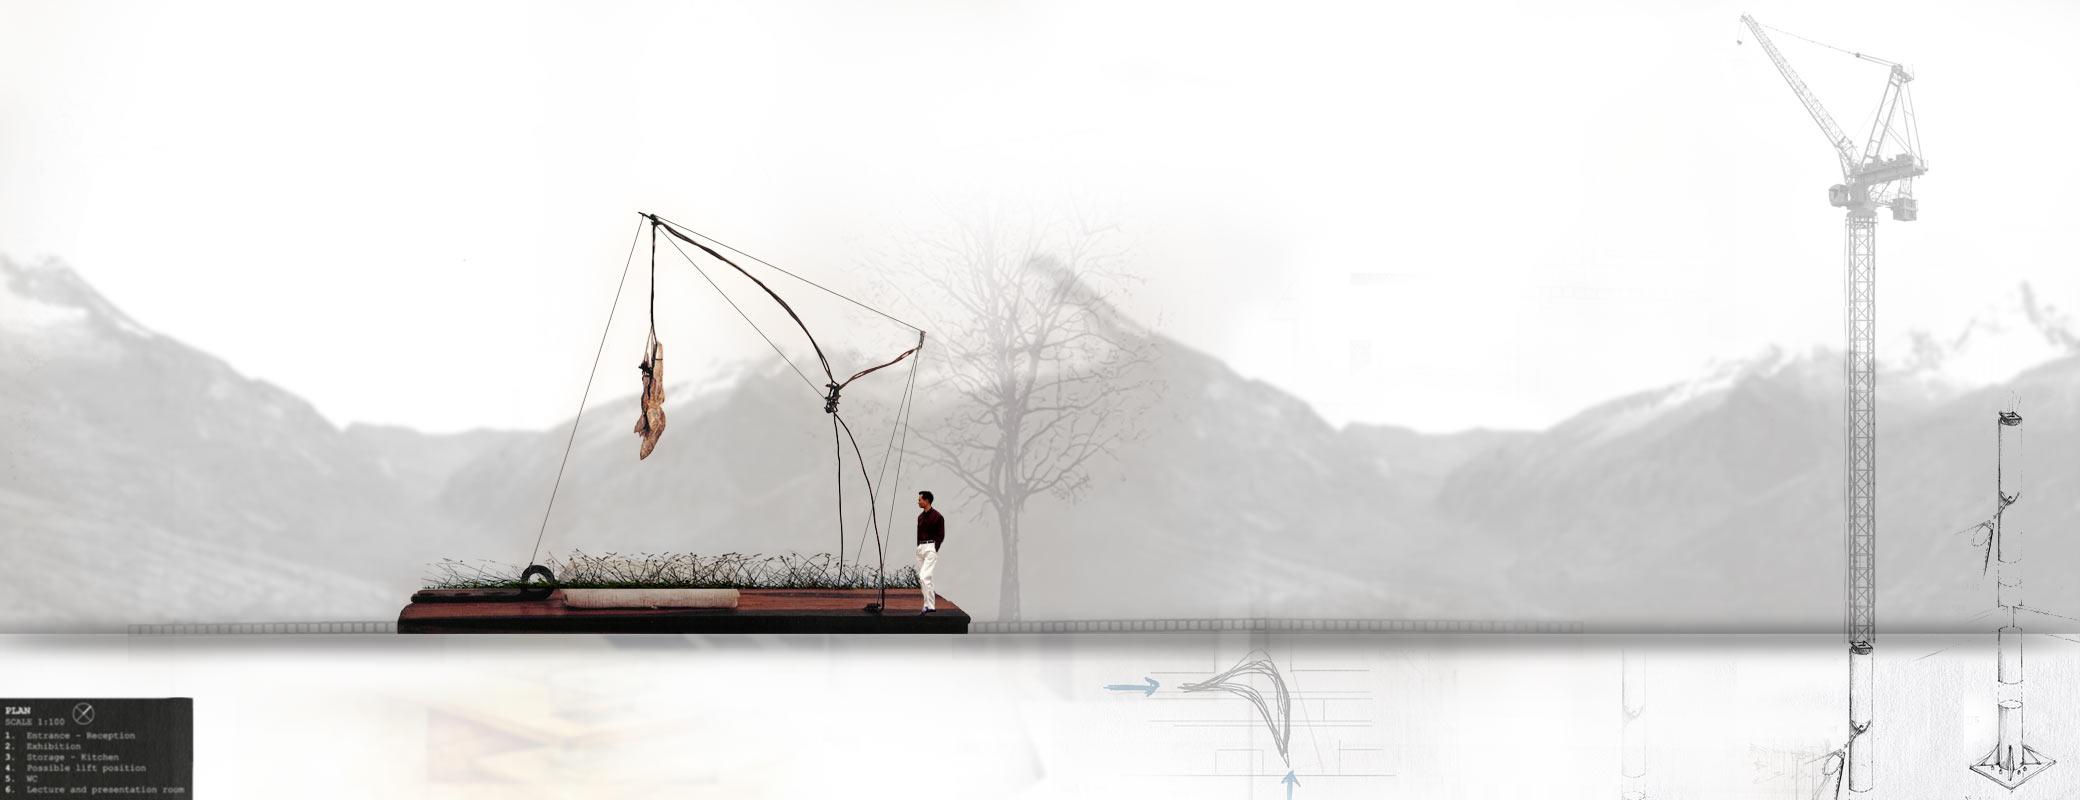 sira_jokinen_lisse_artwork